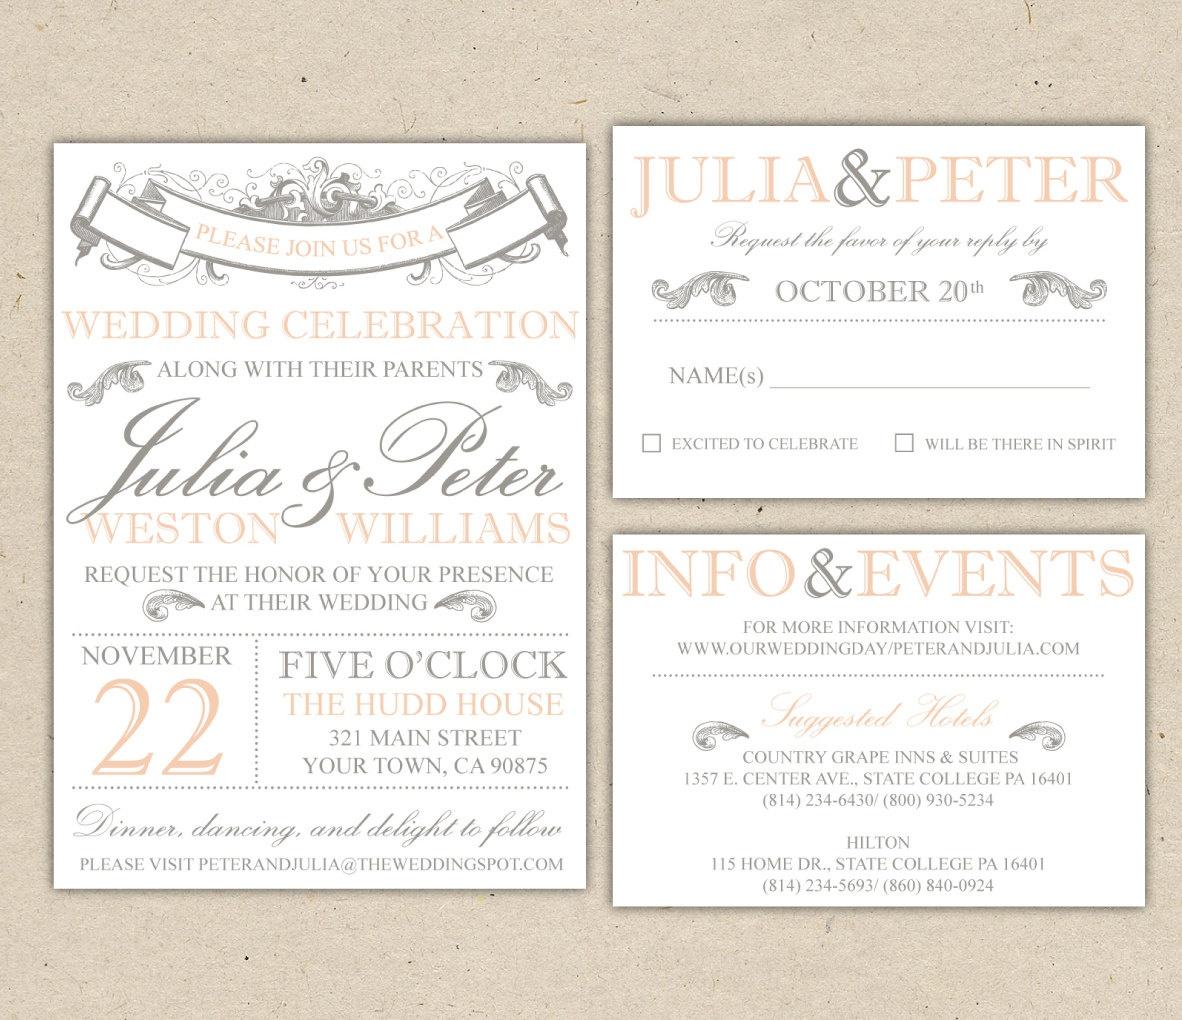 Free Printable Wedding Invitation Templates For Word Wedding - Free Printable Wedding Invitations